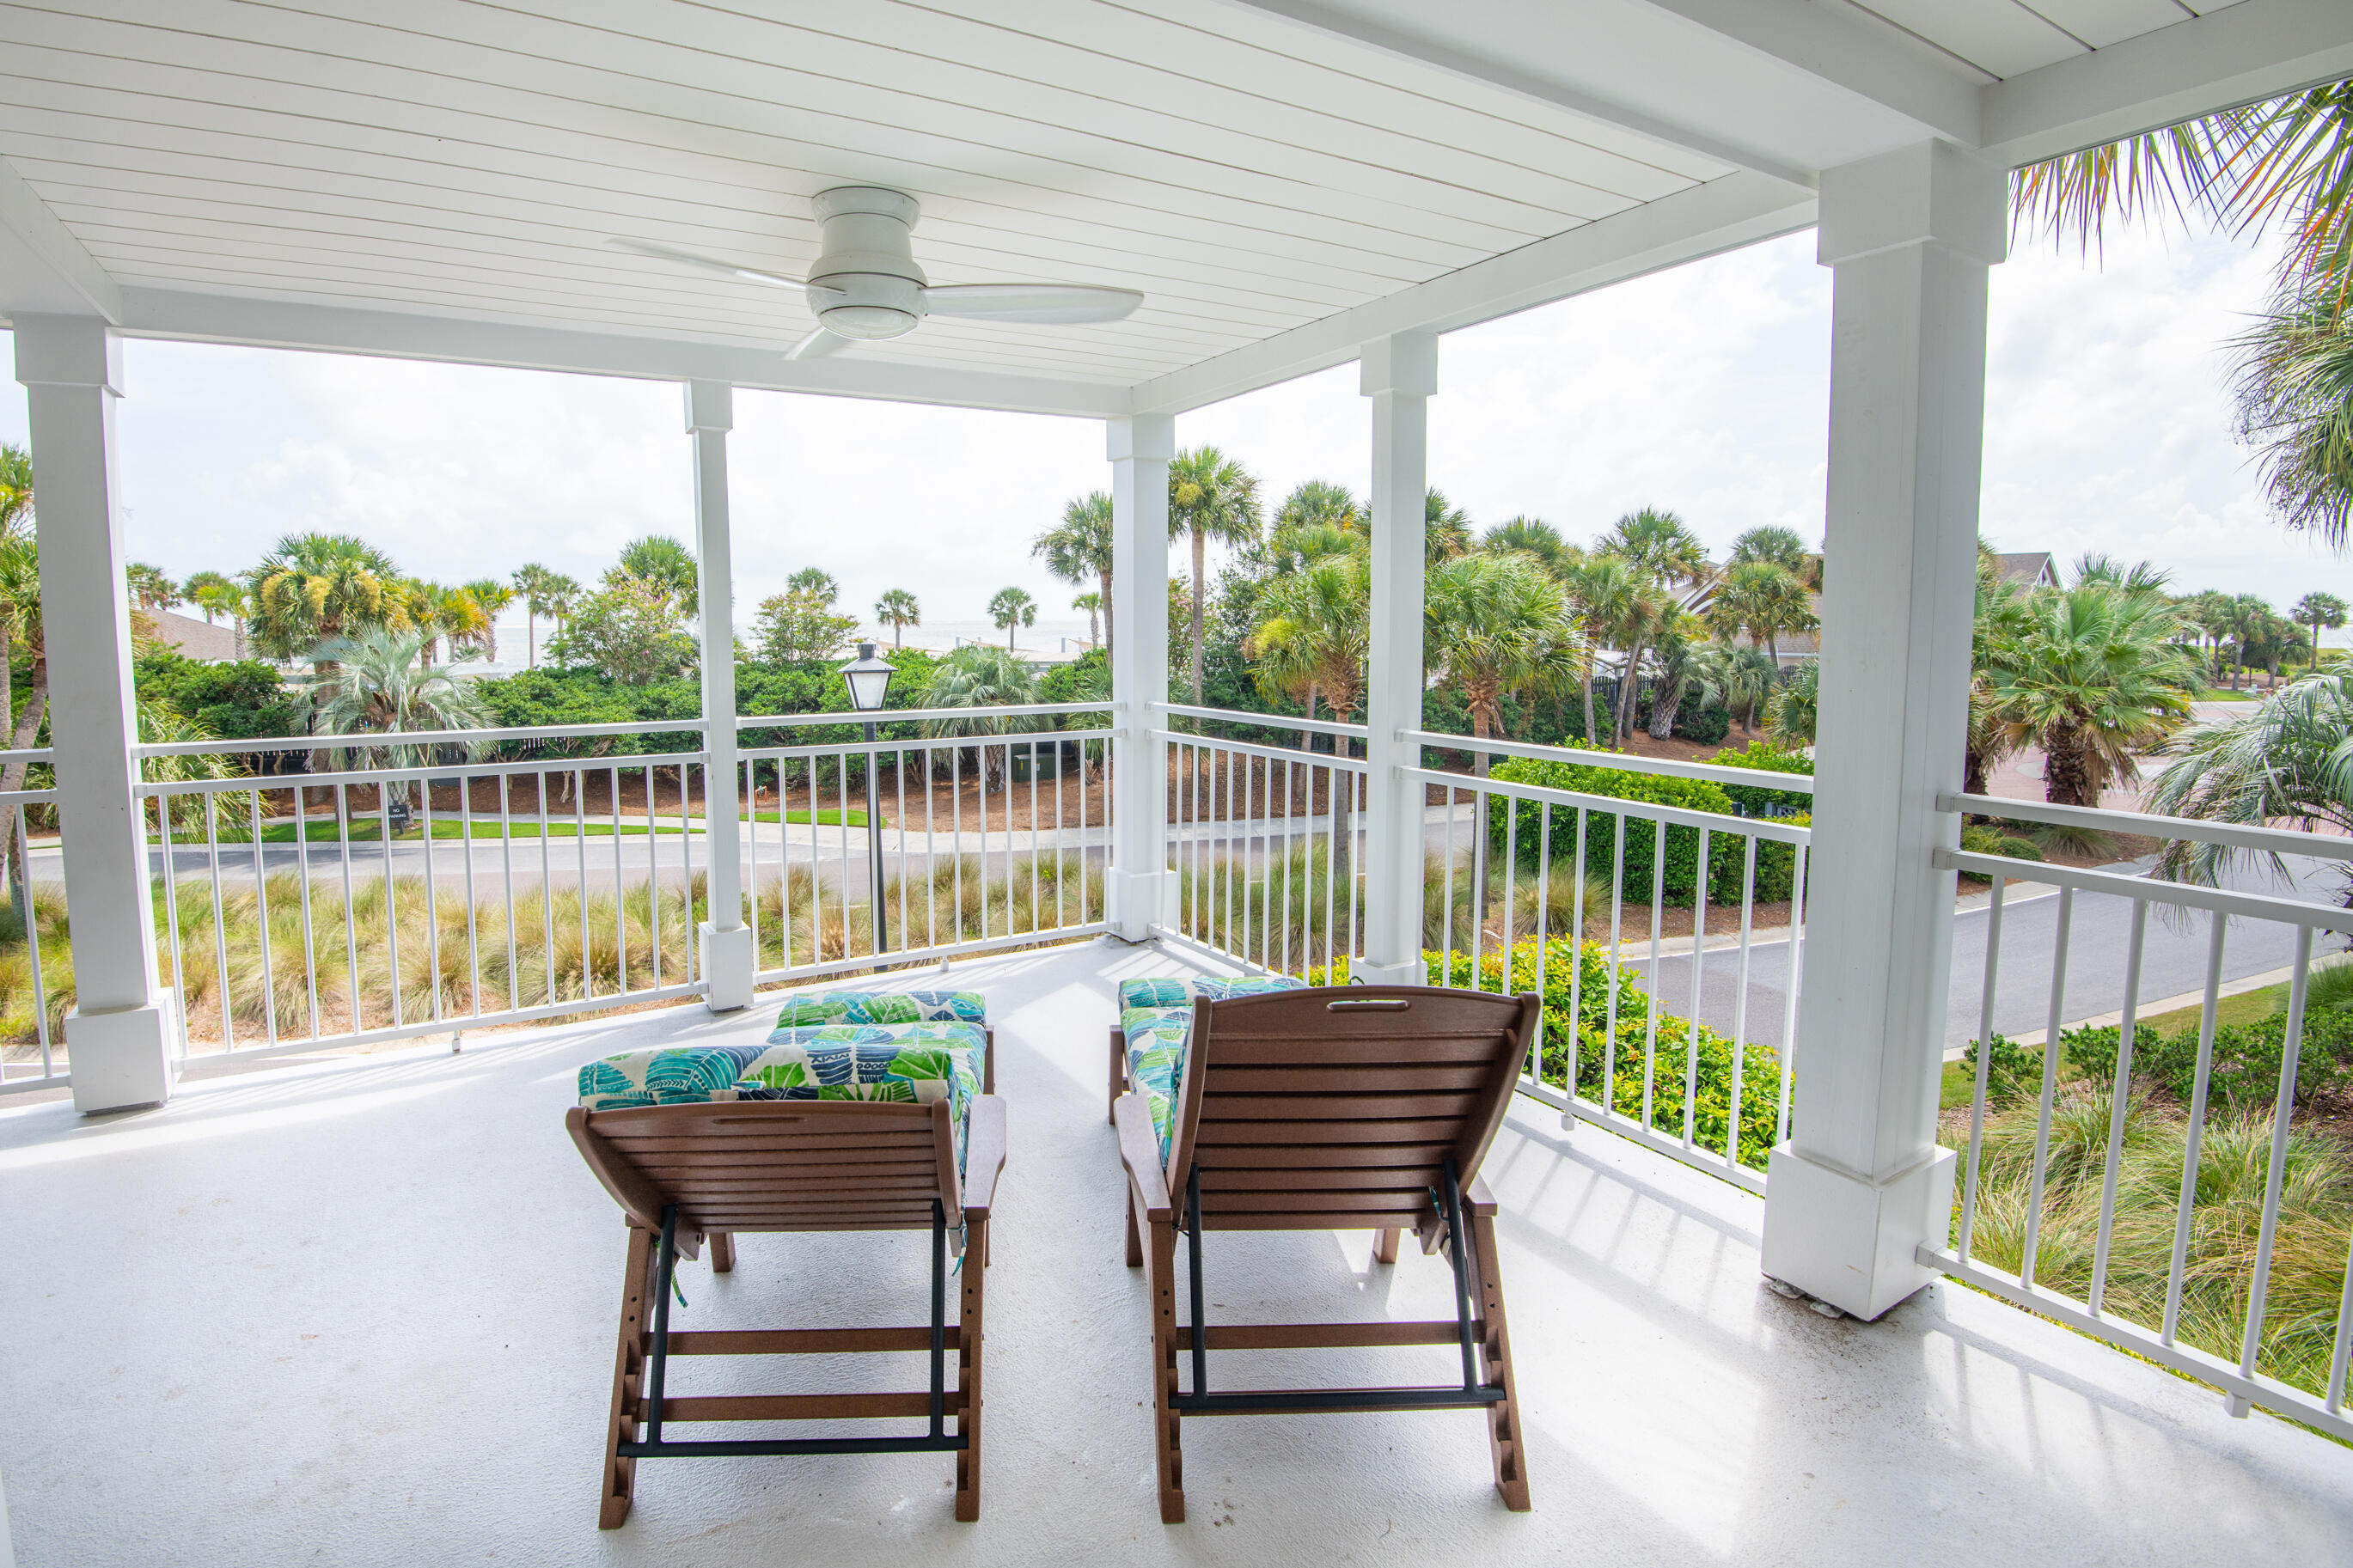 Atrium Villas Homes For Sale - 2935 Atrium Villa, Seabrook Island, SC - 3